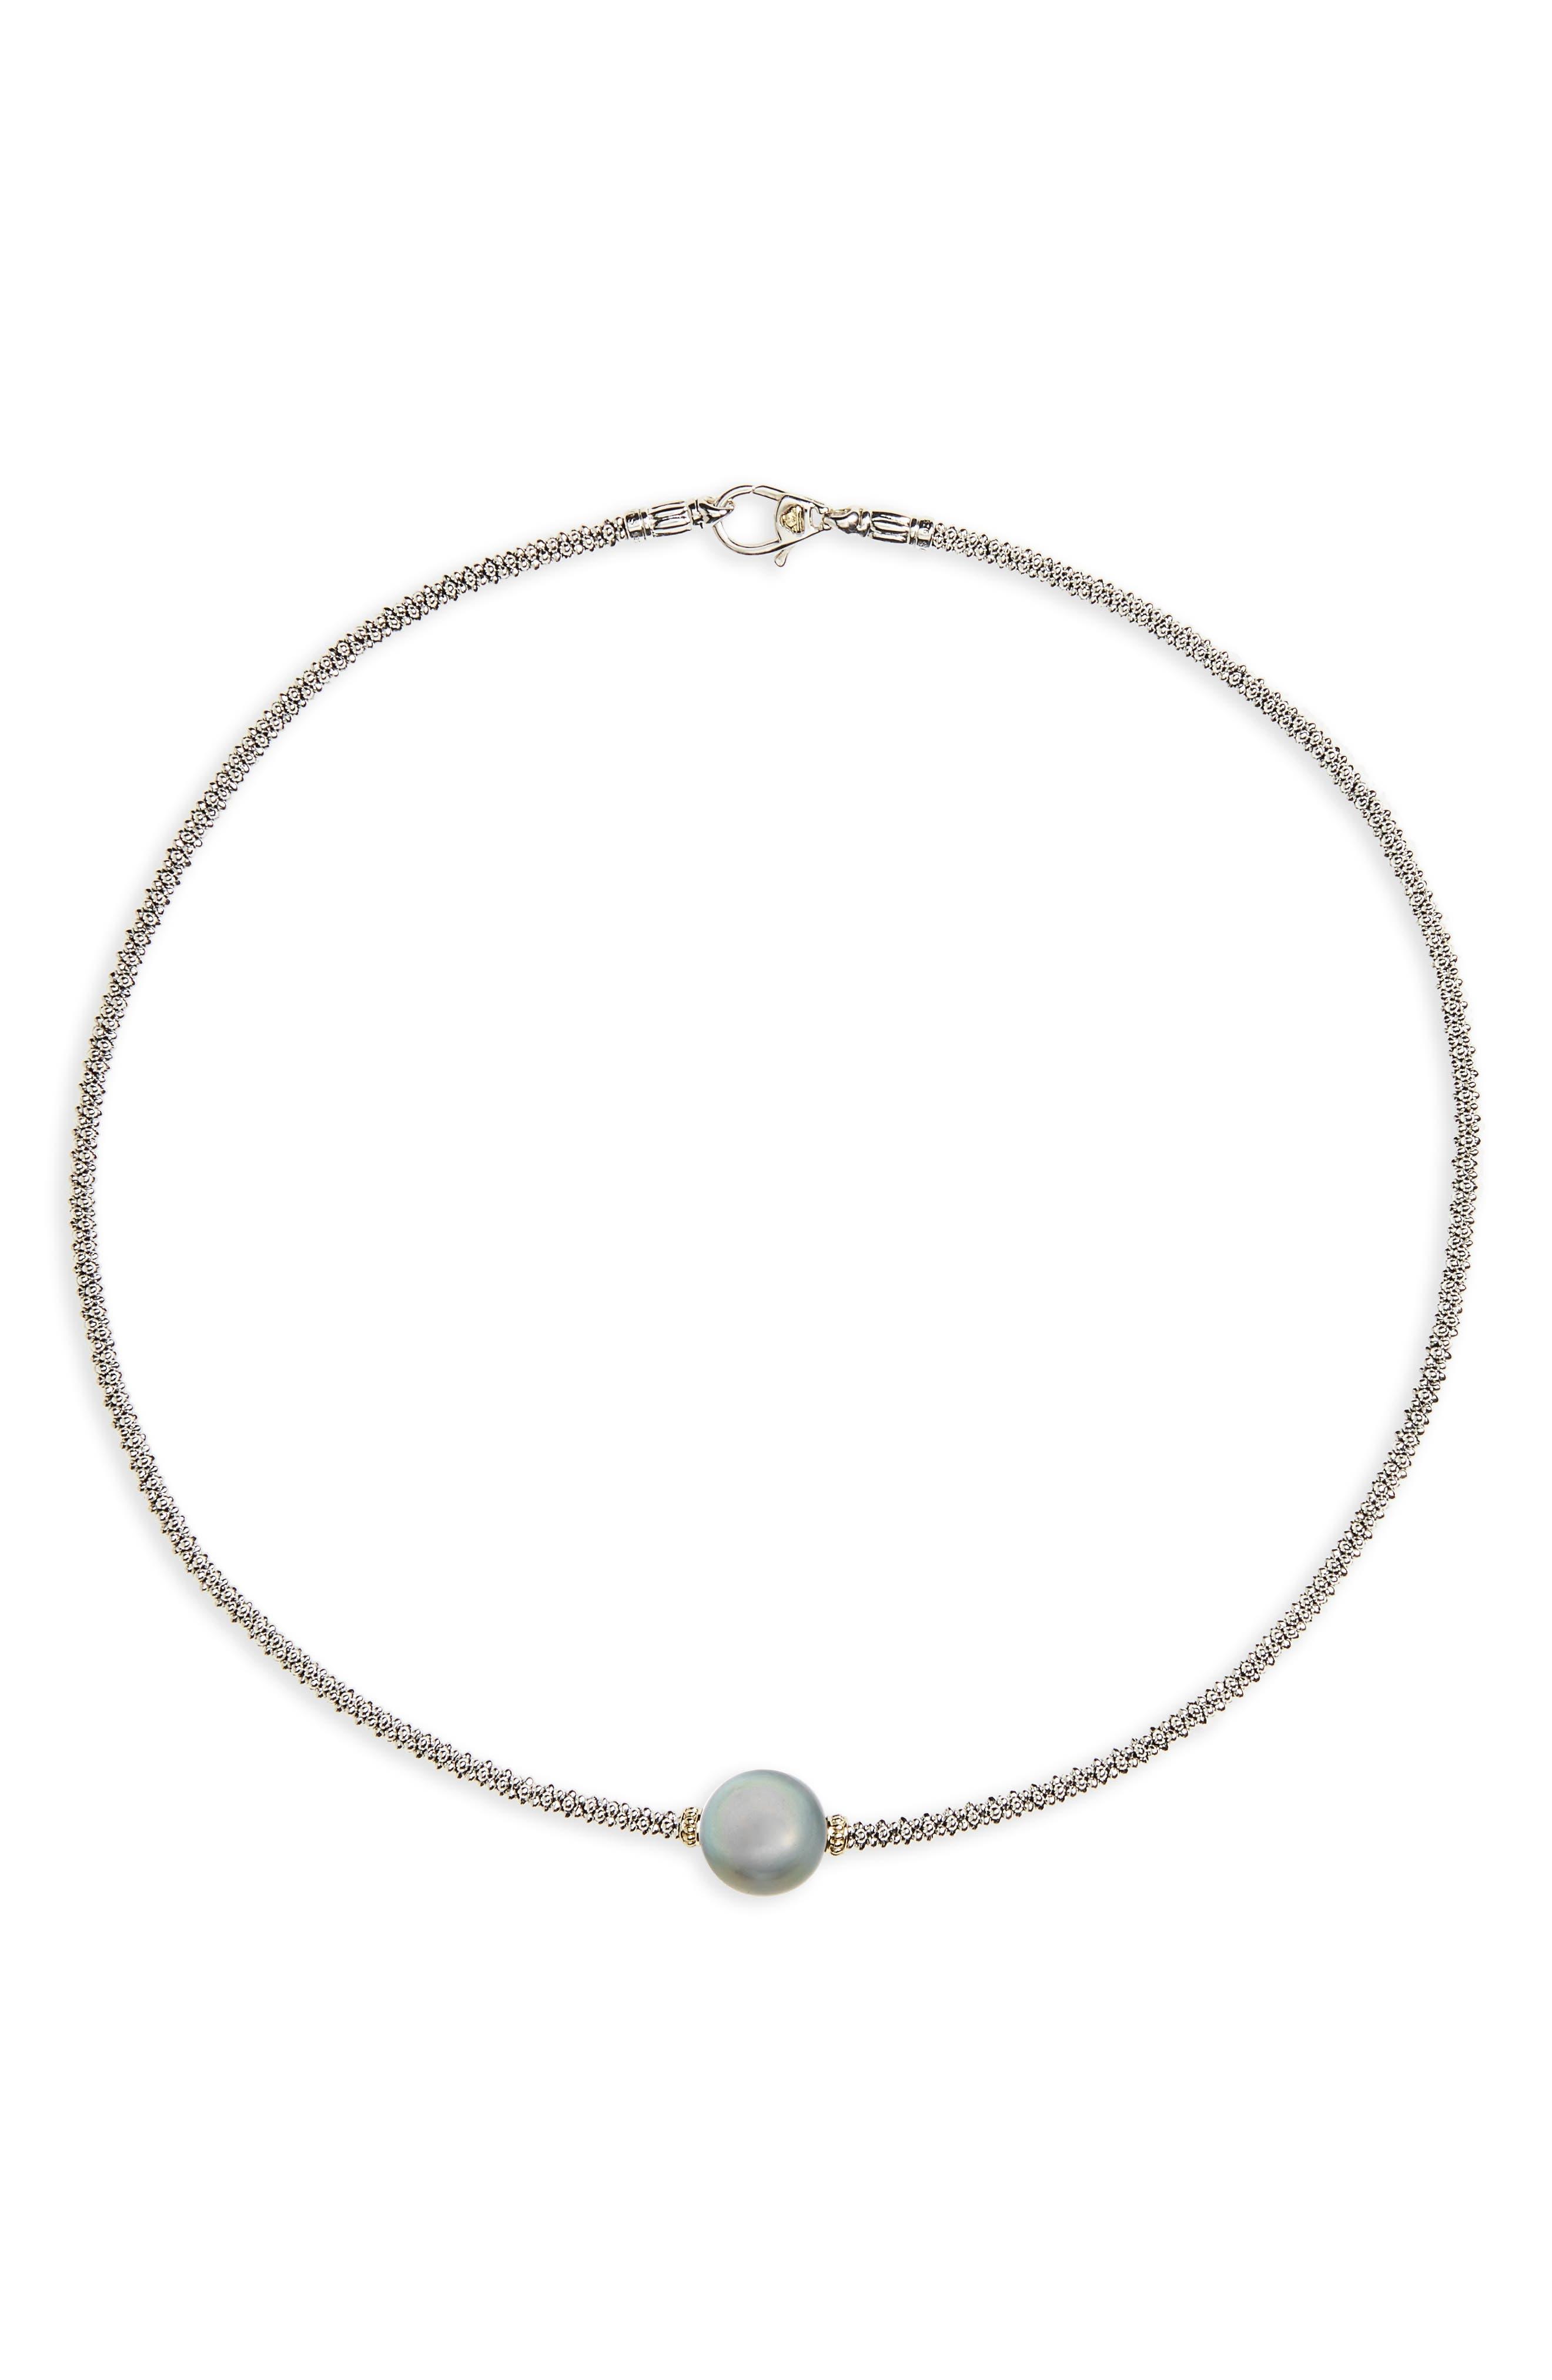 Main Image - LAGOS Luna Pearl Collar Necklace